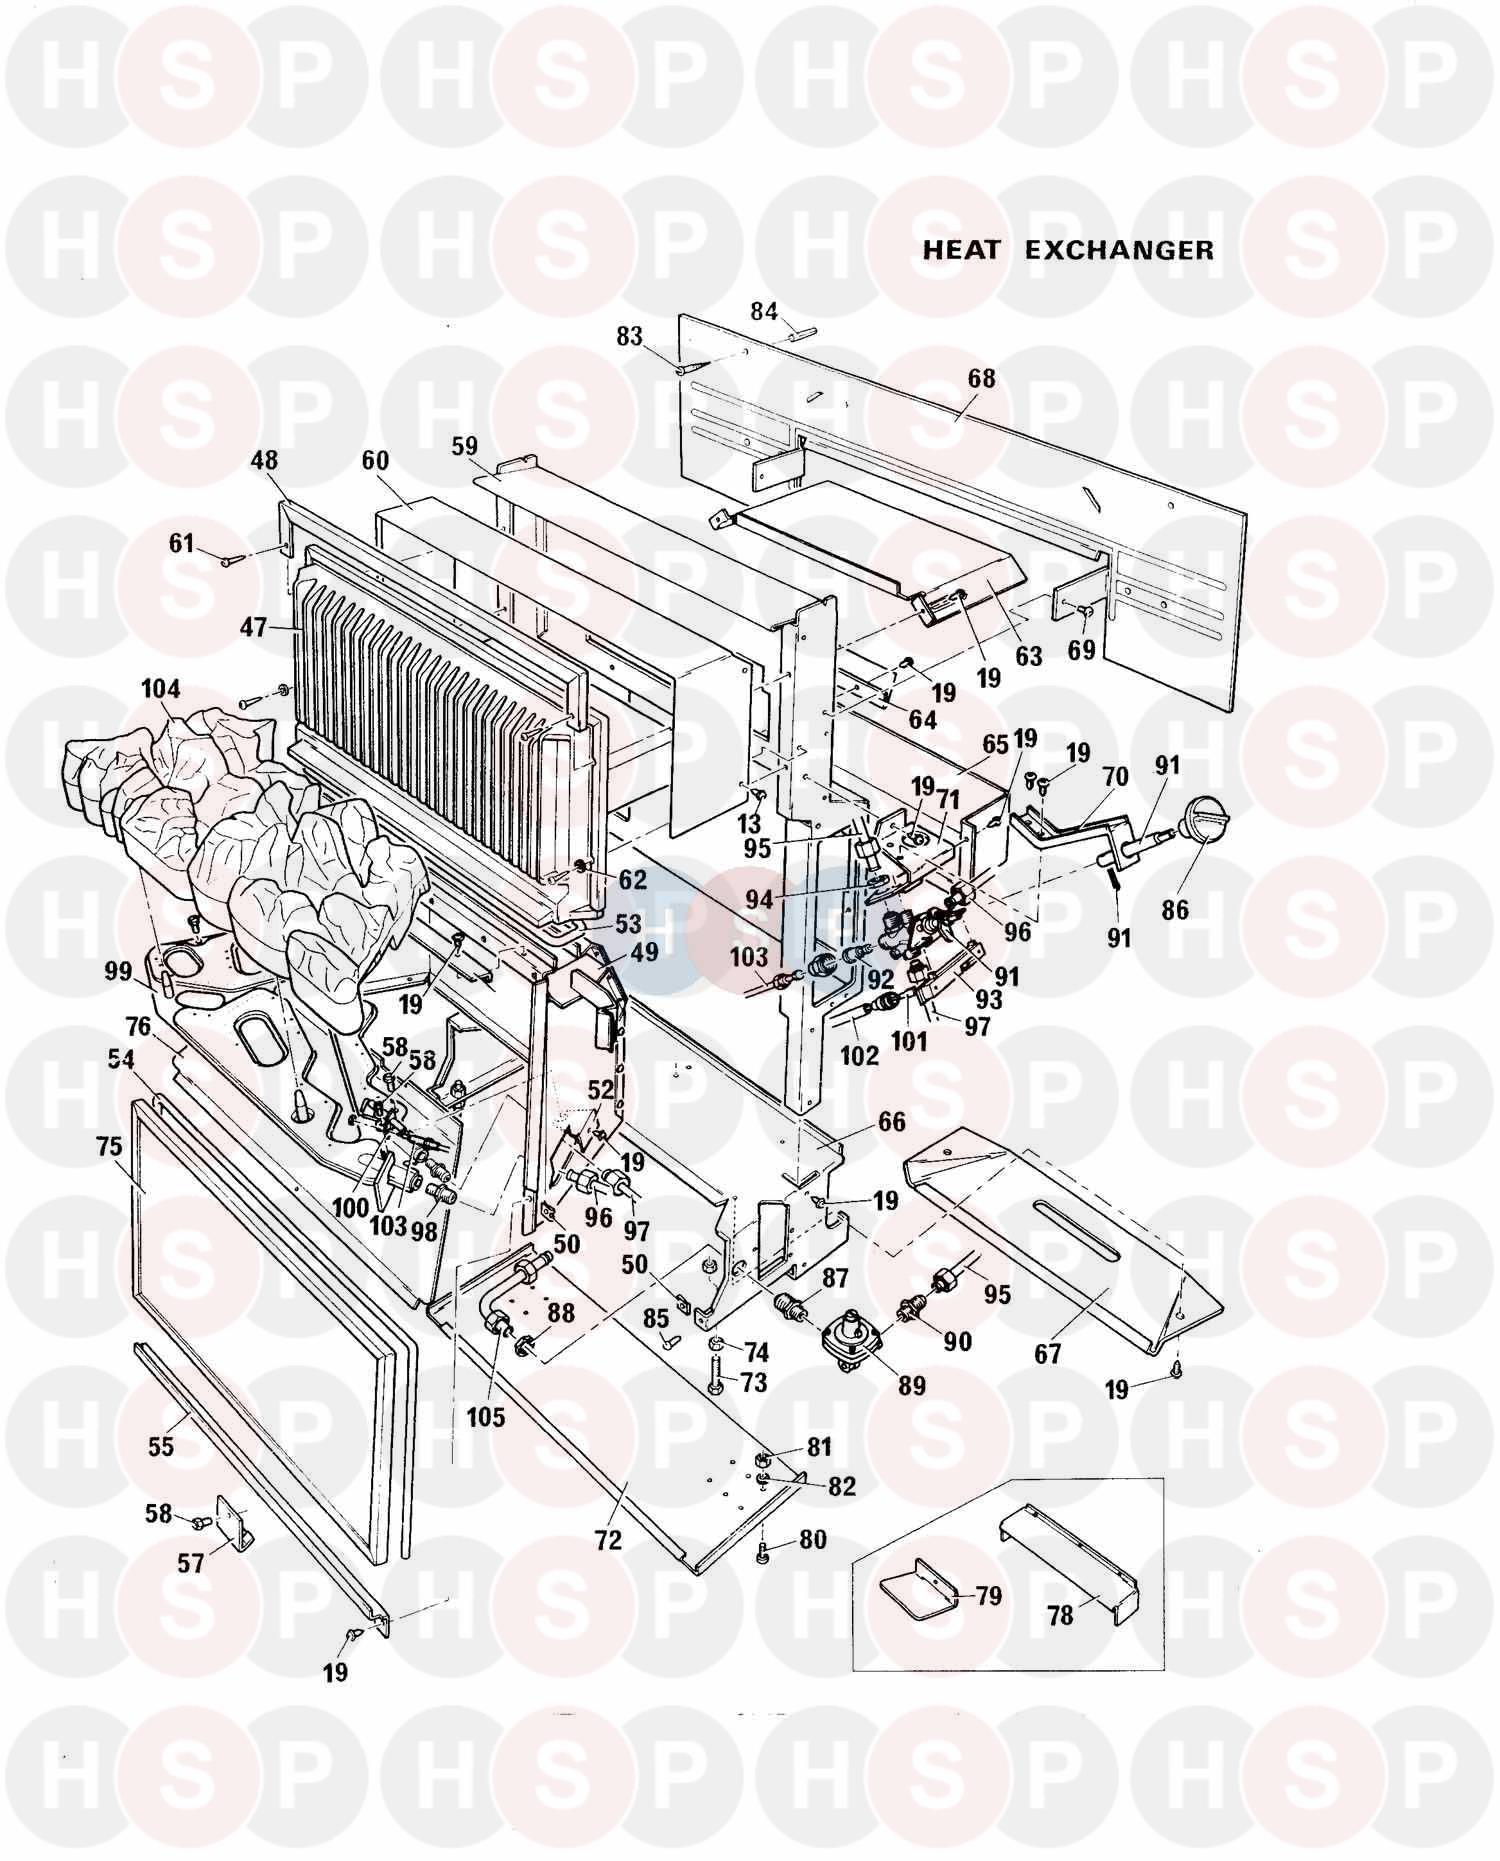 Baxi BERMUDA LFE 3 SUPER Appliance Diagram (HEAT EXCHANGER